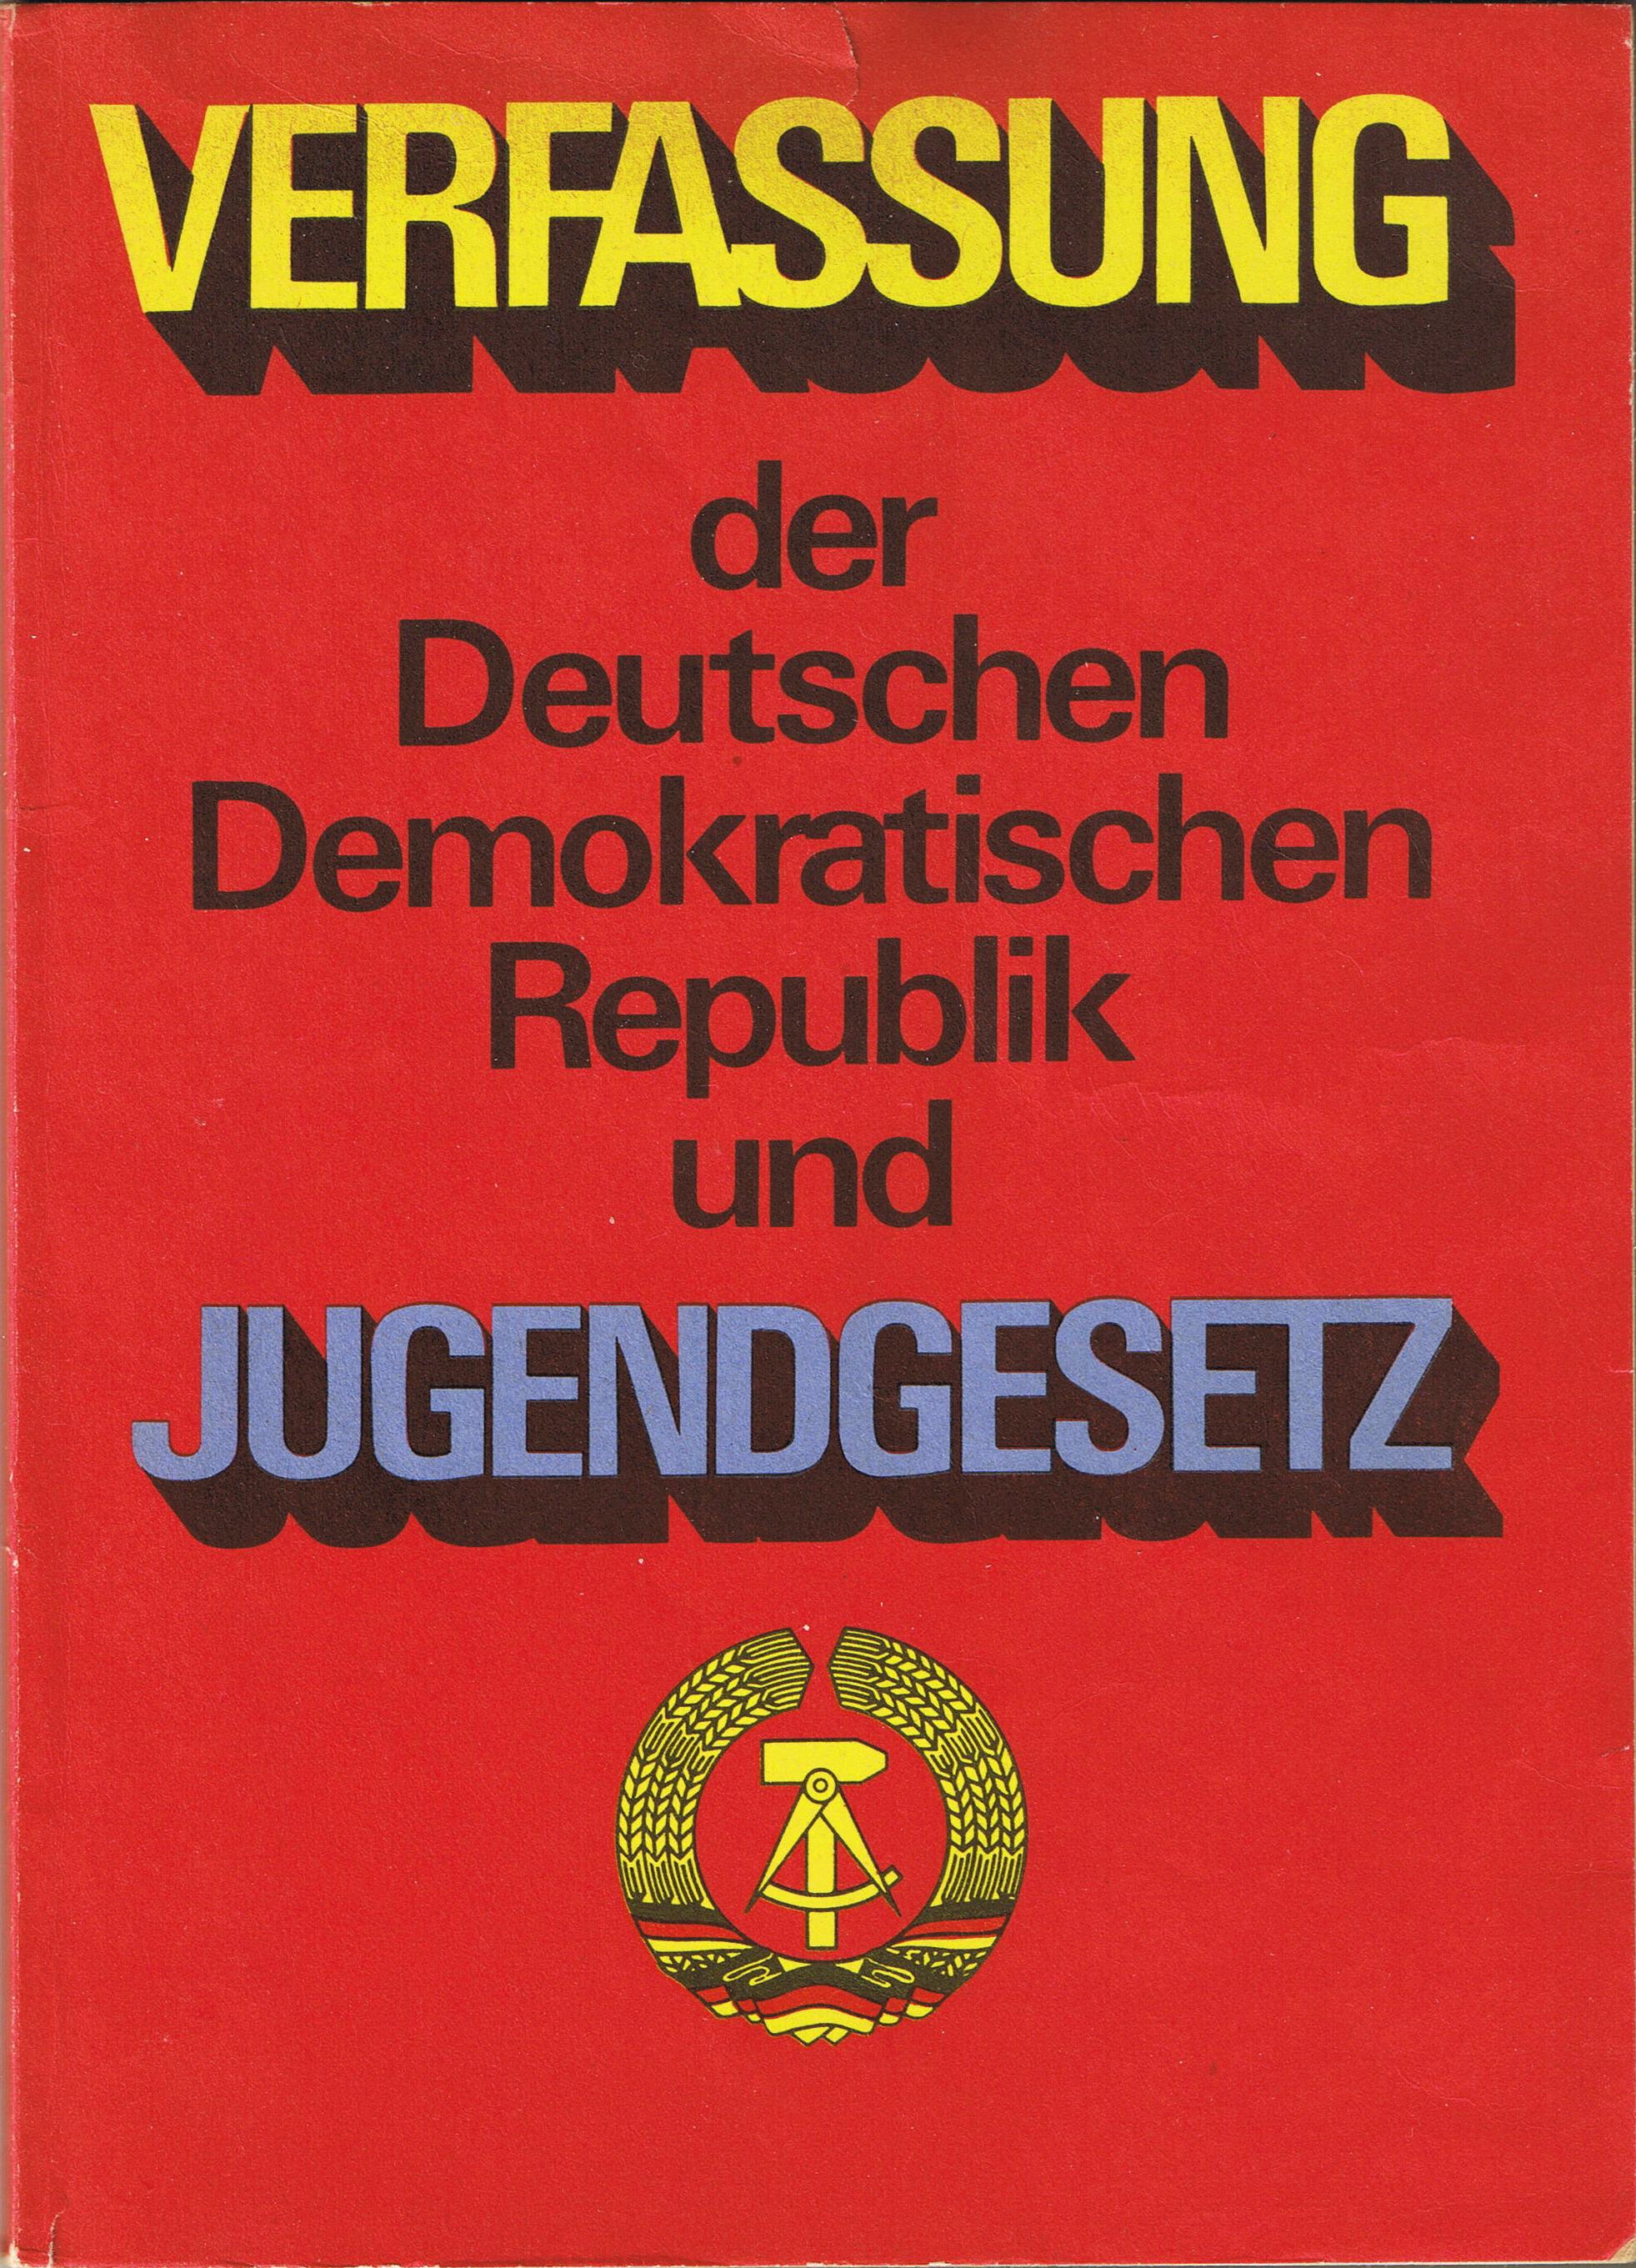 1974 Ddr File:ddr-verfassung-1974.png